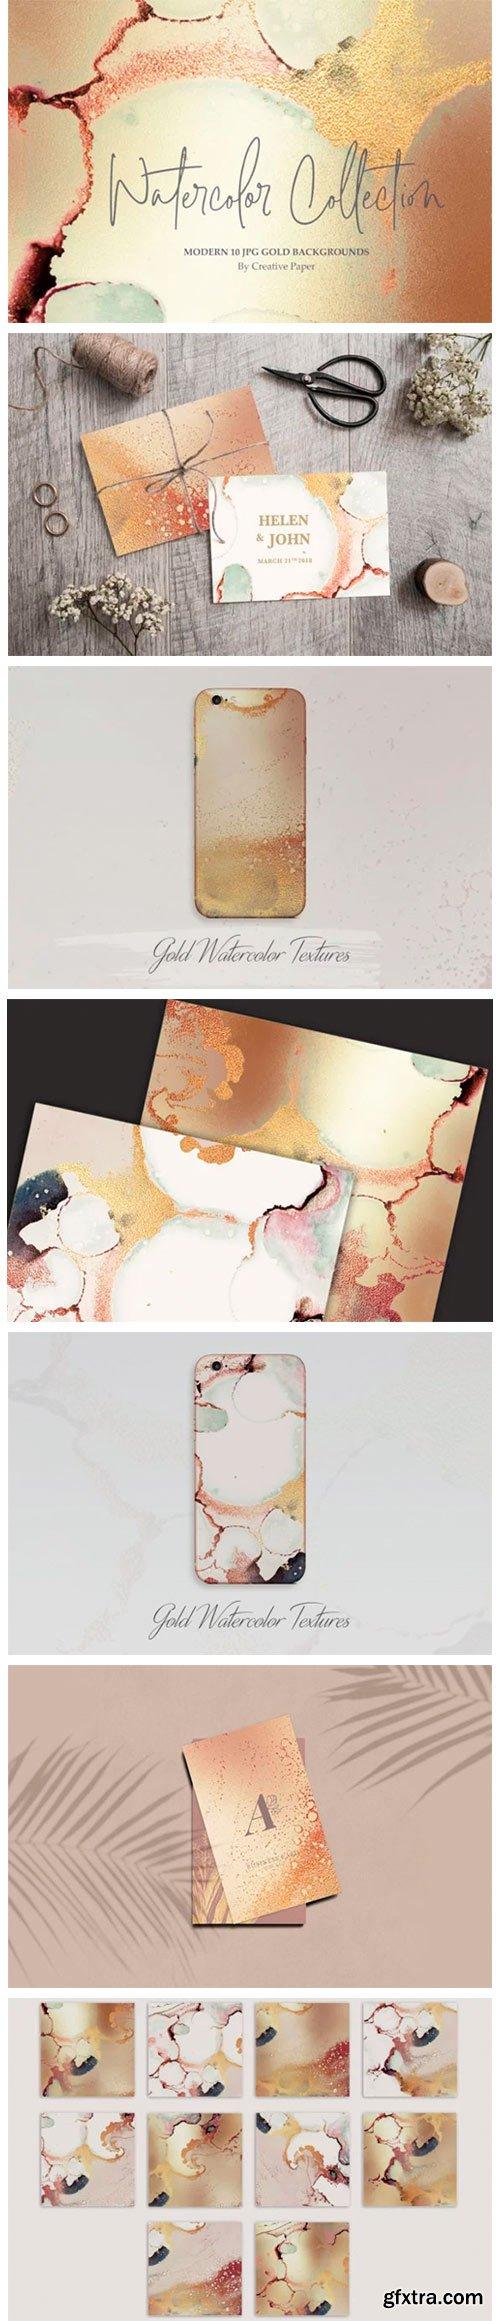 Gold Ink + Watercolor Foil Textures 2061689